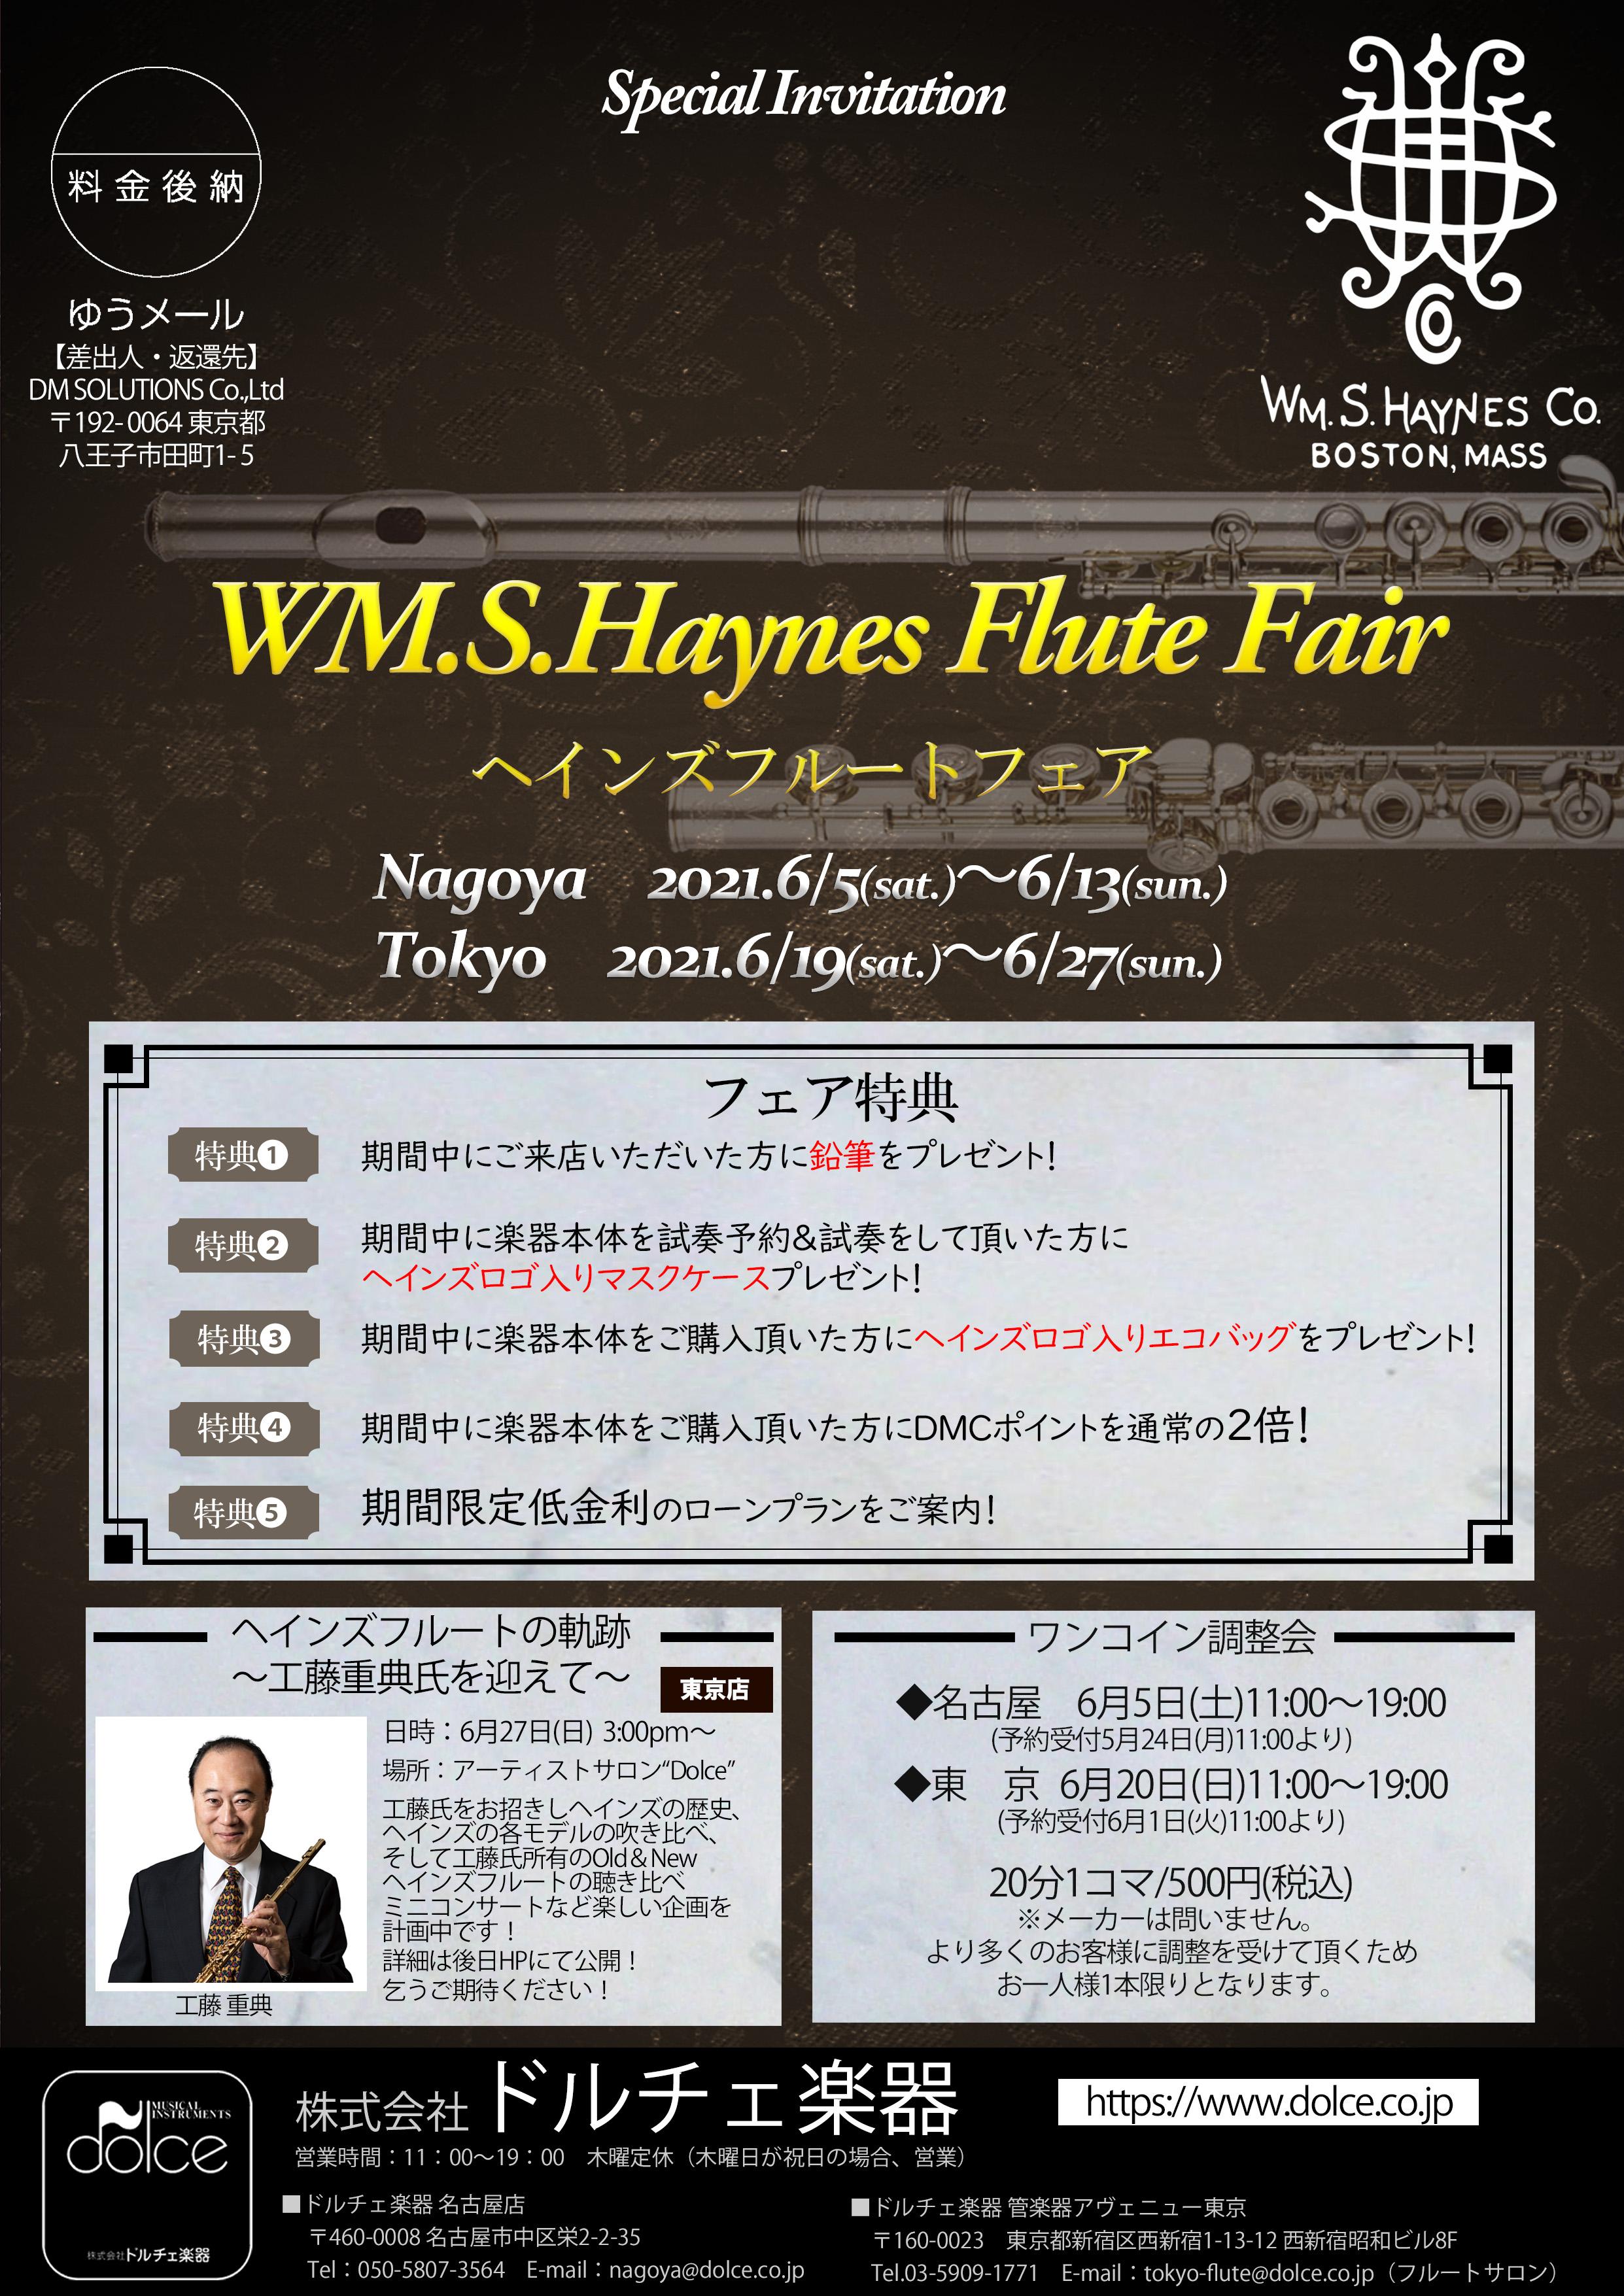 heynesfair